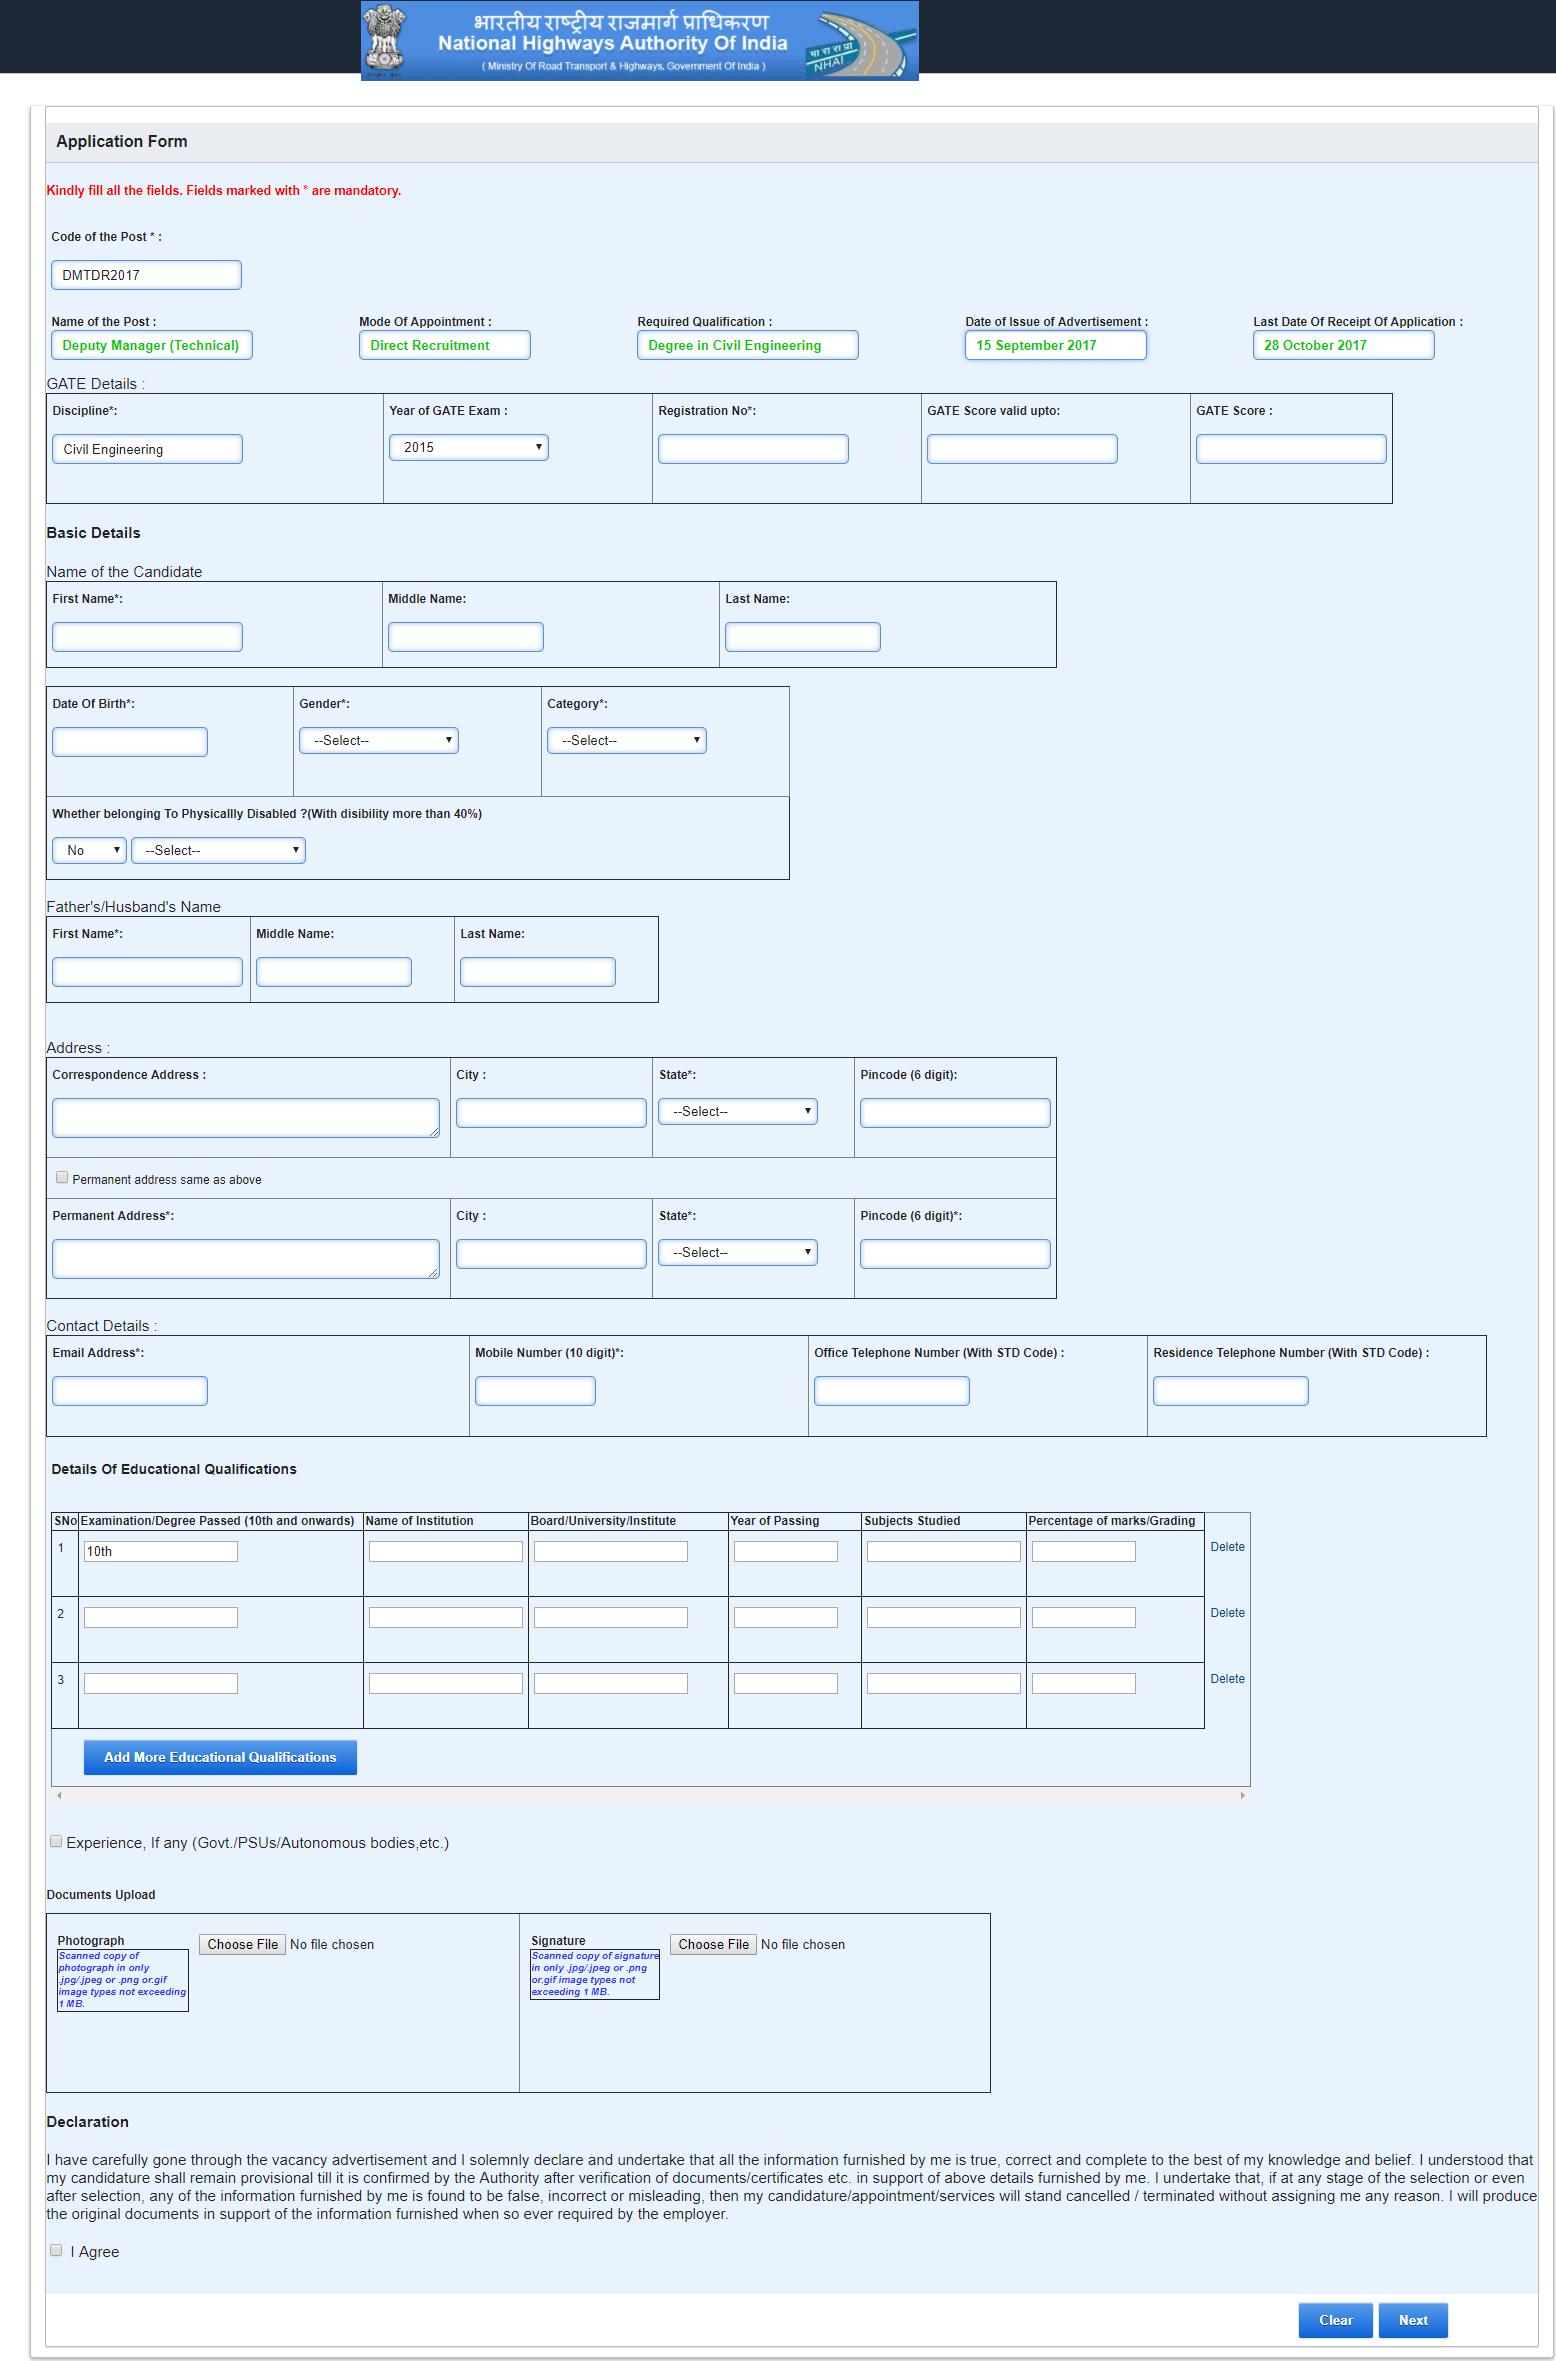 C:\Users\Admin\Downloads\FireShot\Application Form -.png